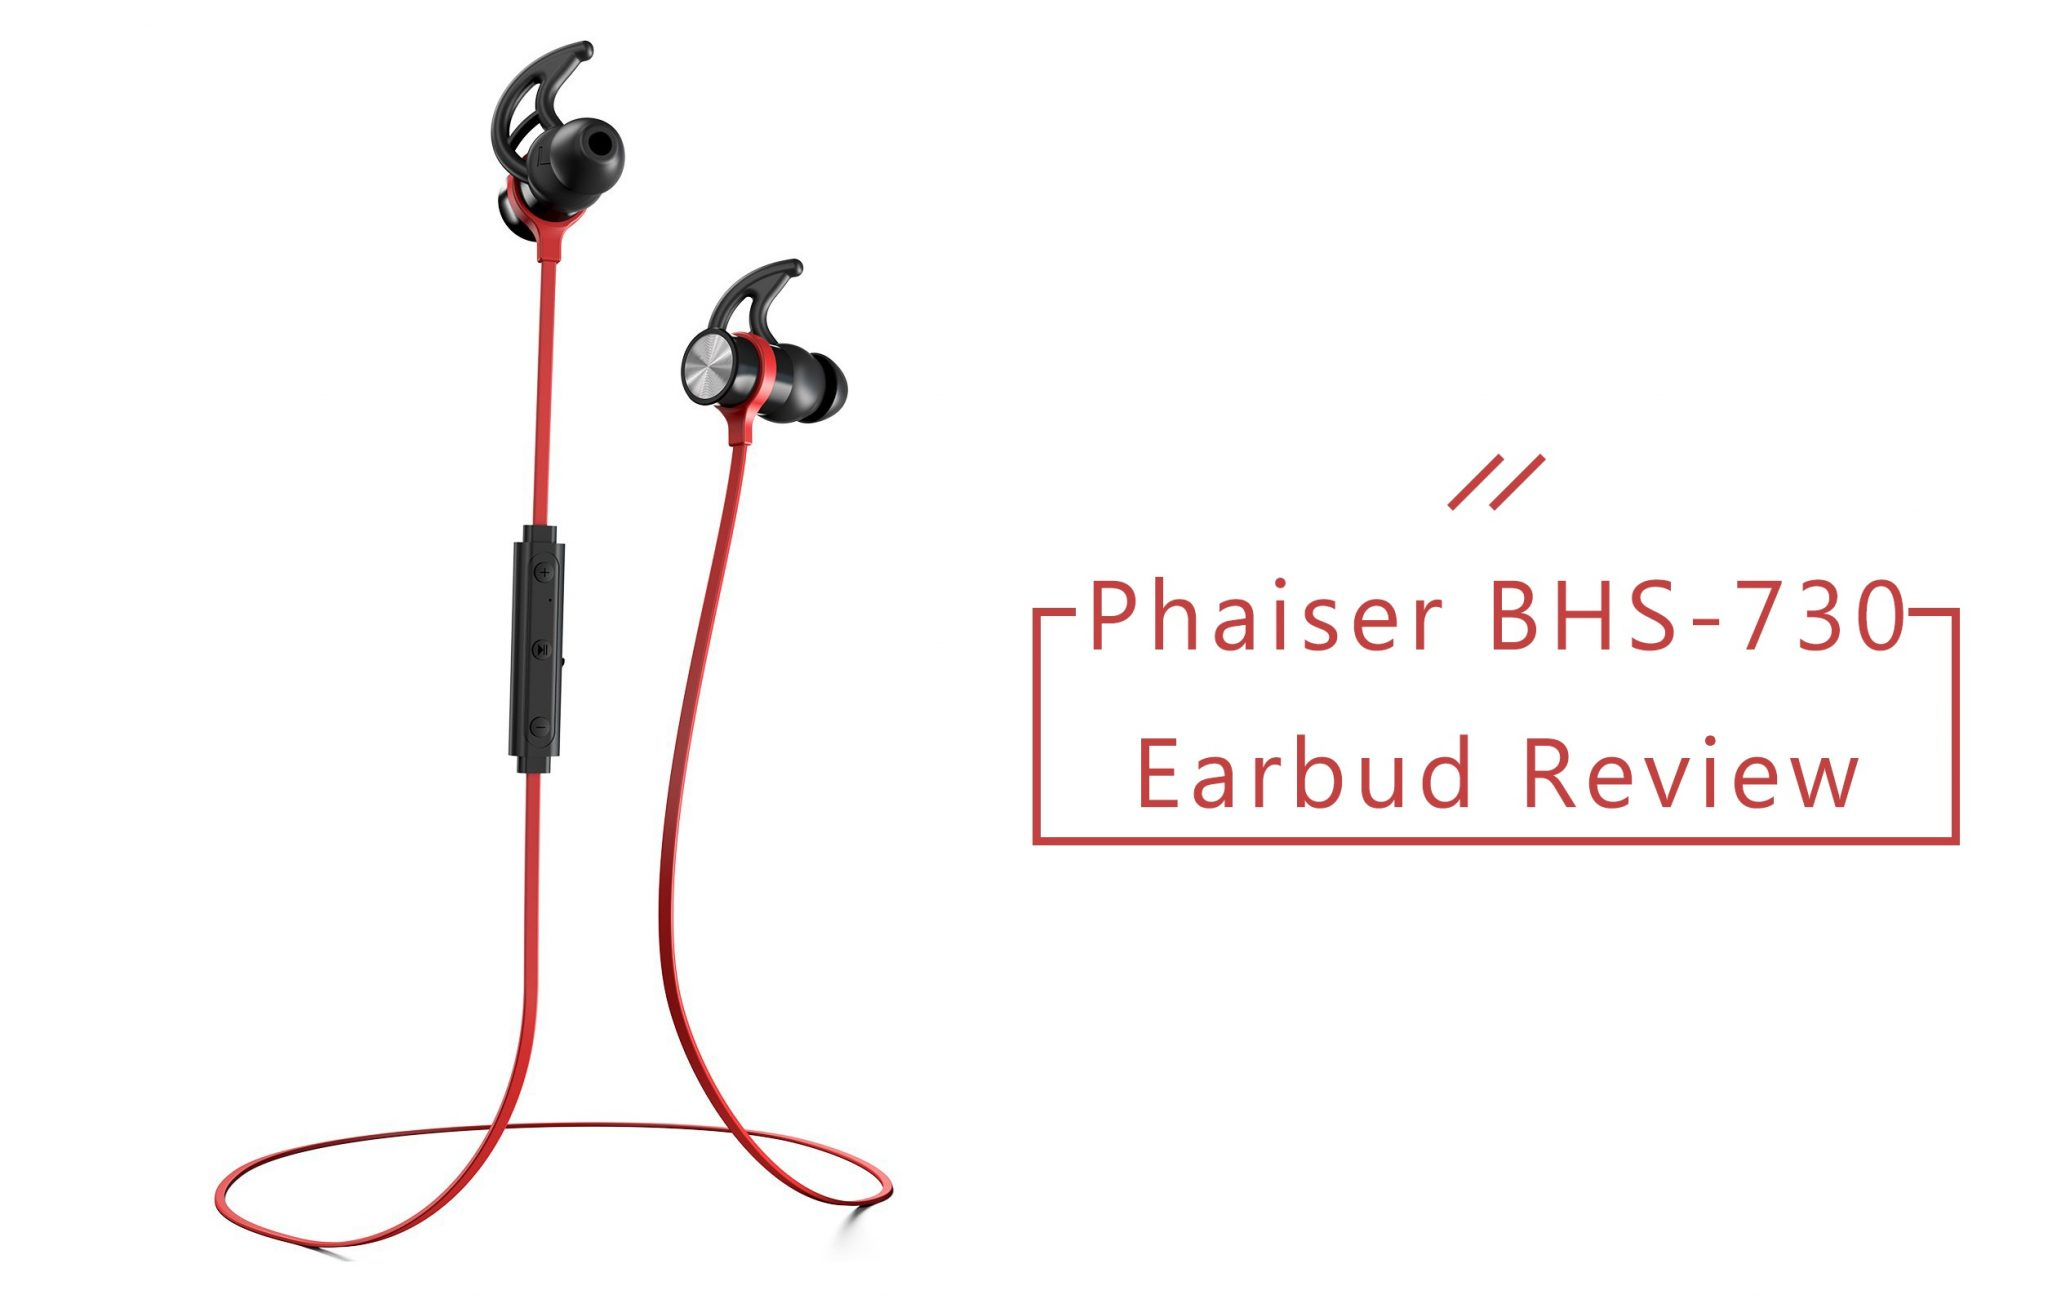 Phaiser BHS-730 Earbud